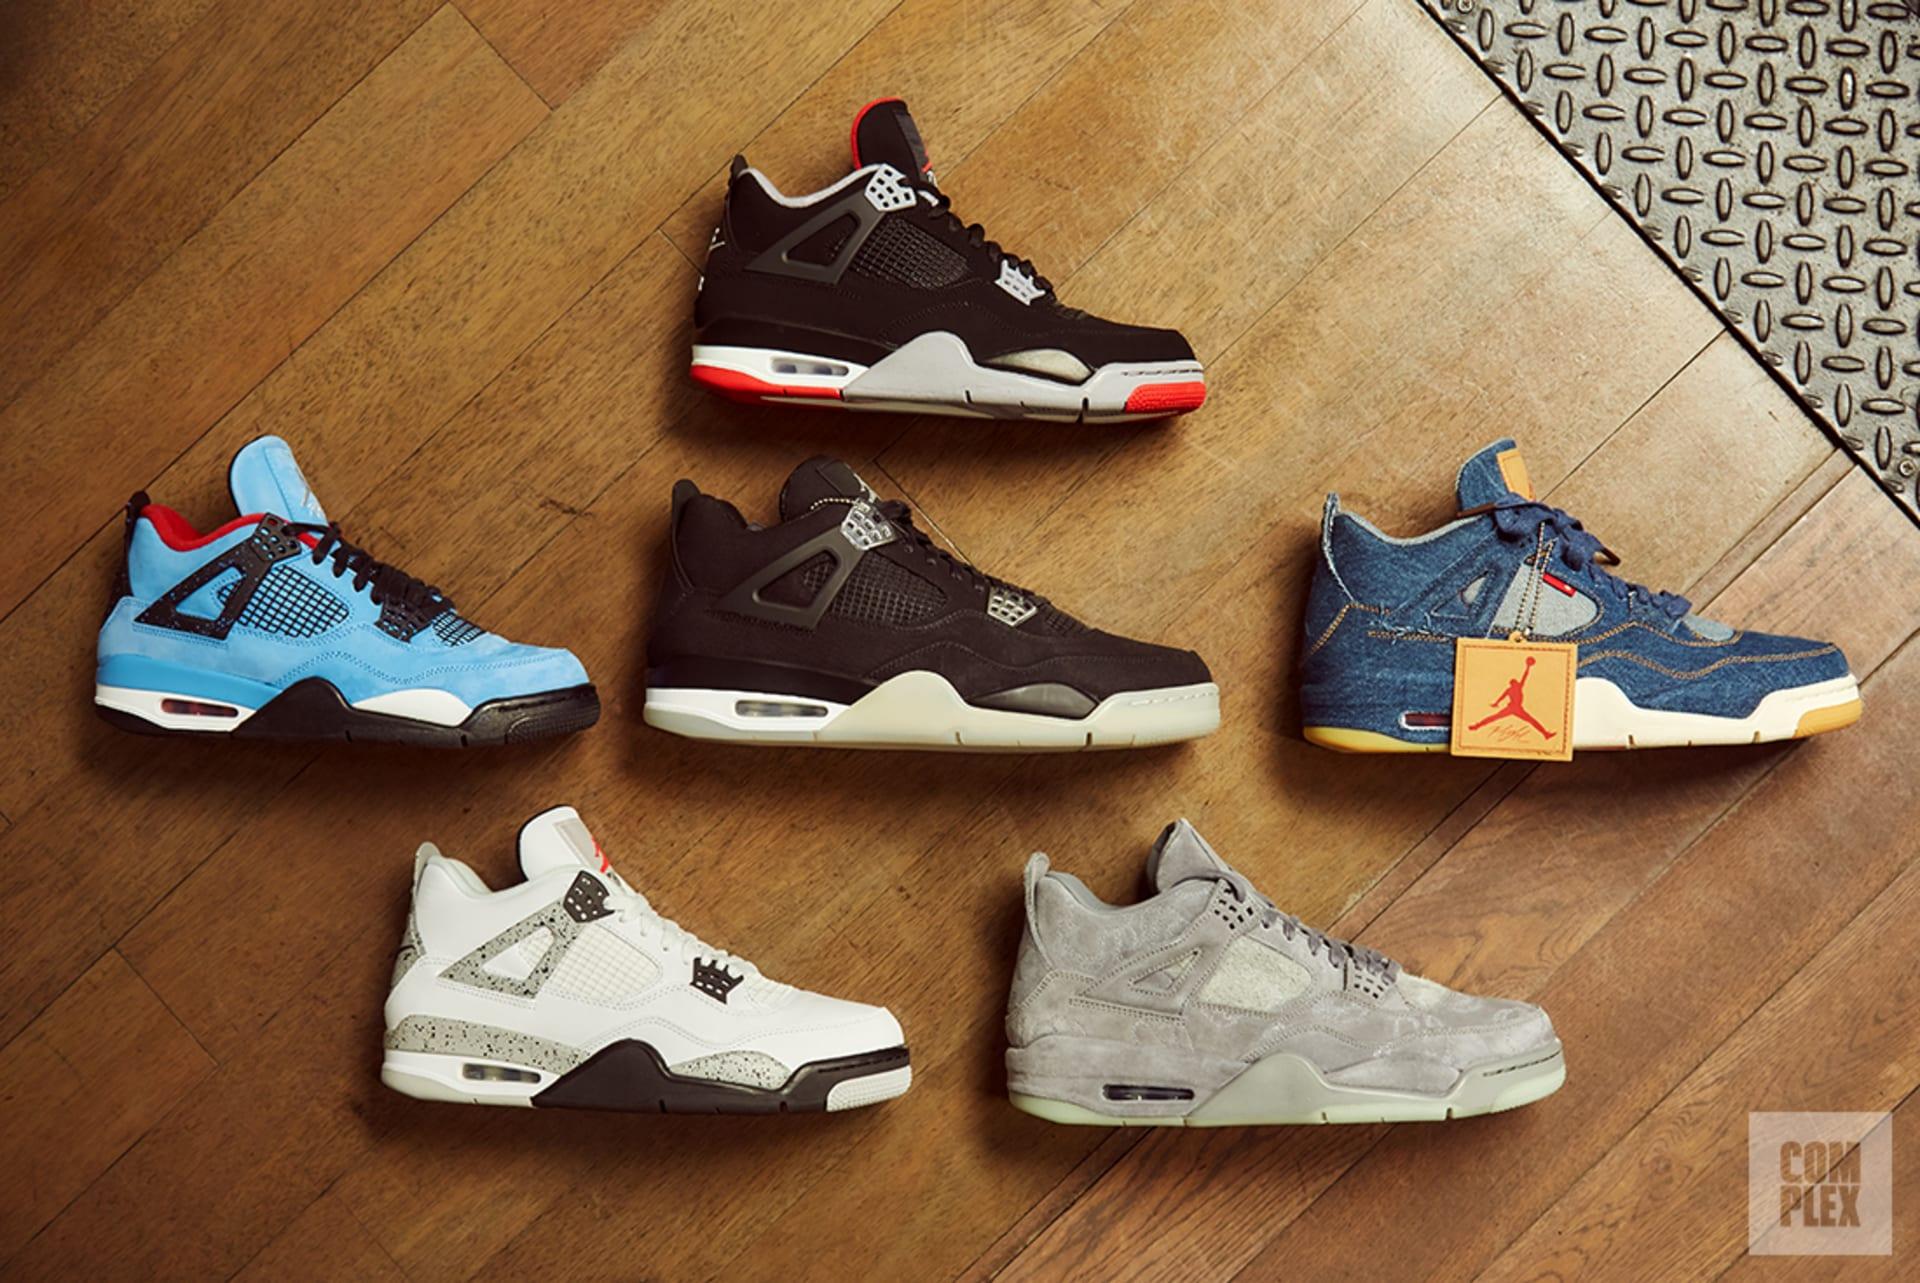 d3ab65f5218272 Variety of Air Jordan IVs. Image via Complex Original David Cabrera. All  sneakers courtesy of Stadium Goods.